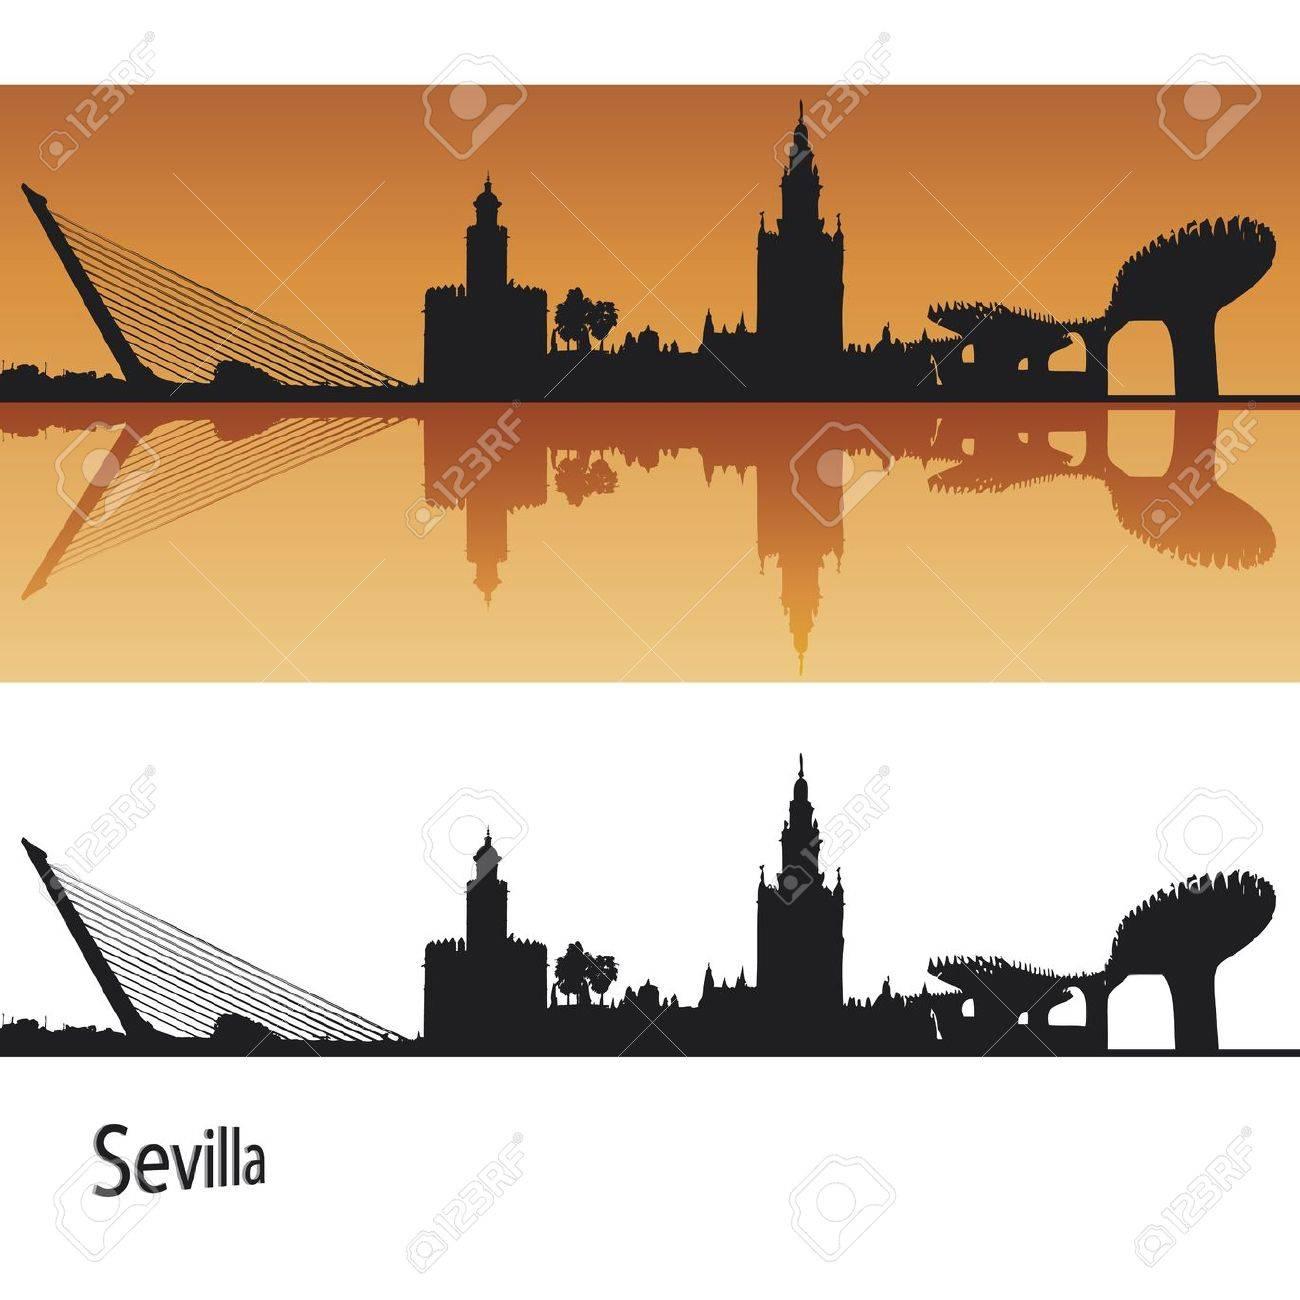 Seville Skyline in orange background in editable vector file Stock Vector - 11157304